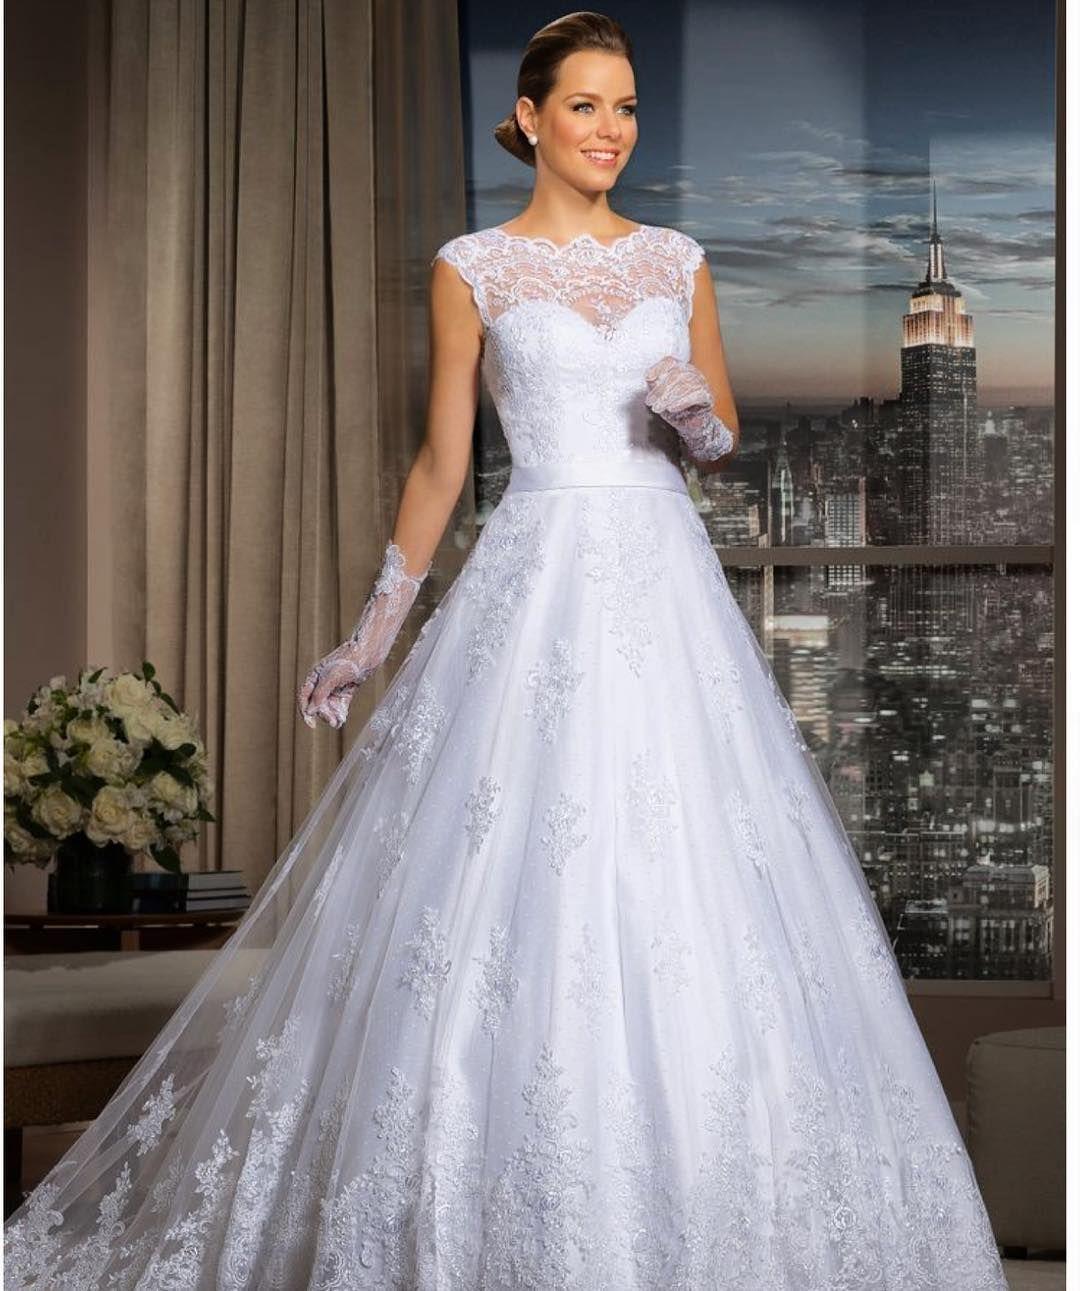 Big girl wedding dresses  Dress incrível Wedding Day Weddings Planner Plan Planning Your Big